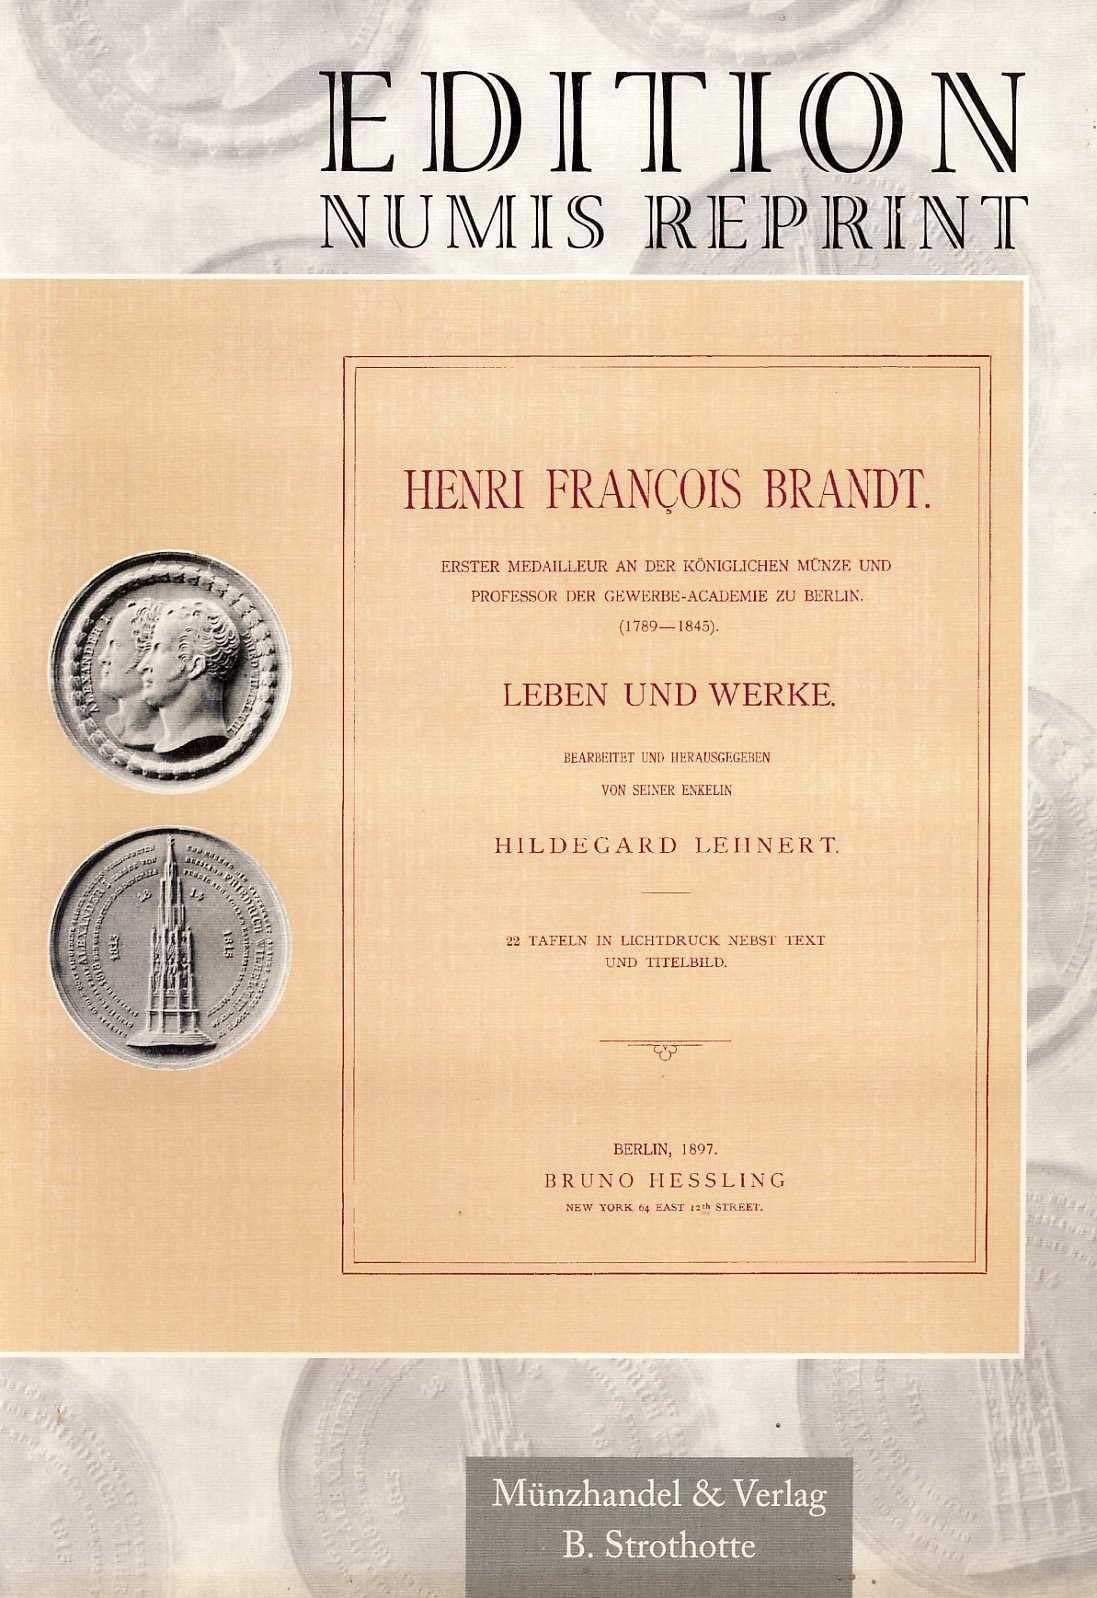 Lehnert Henry Francois Brandt Leben und Werke Erster Medailleur